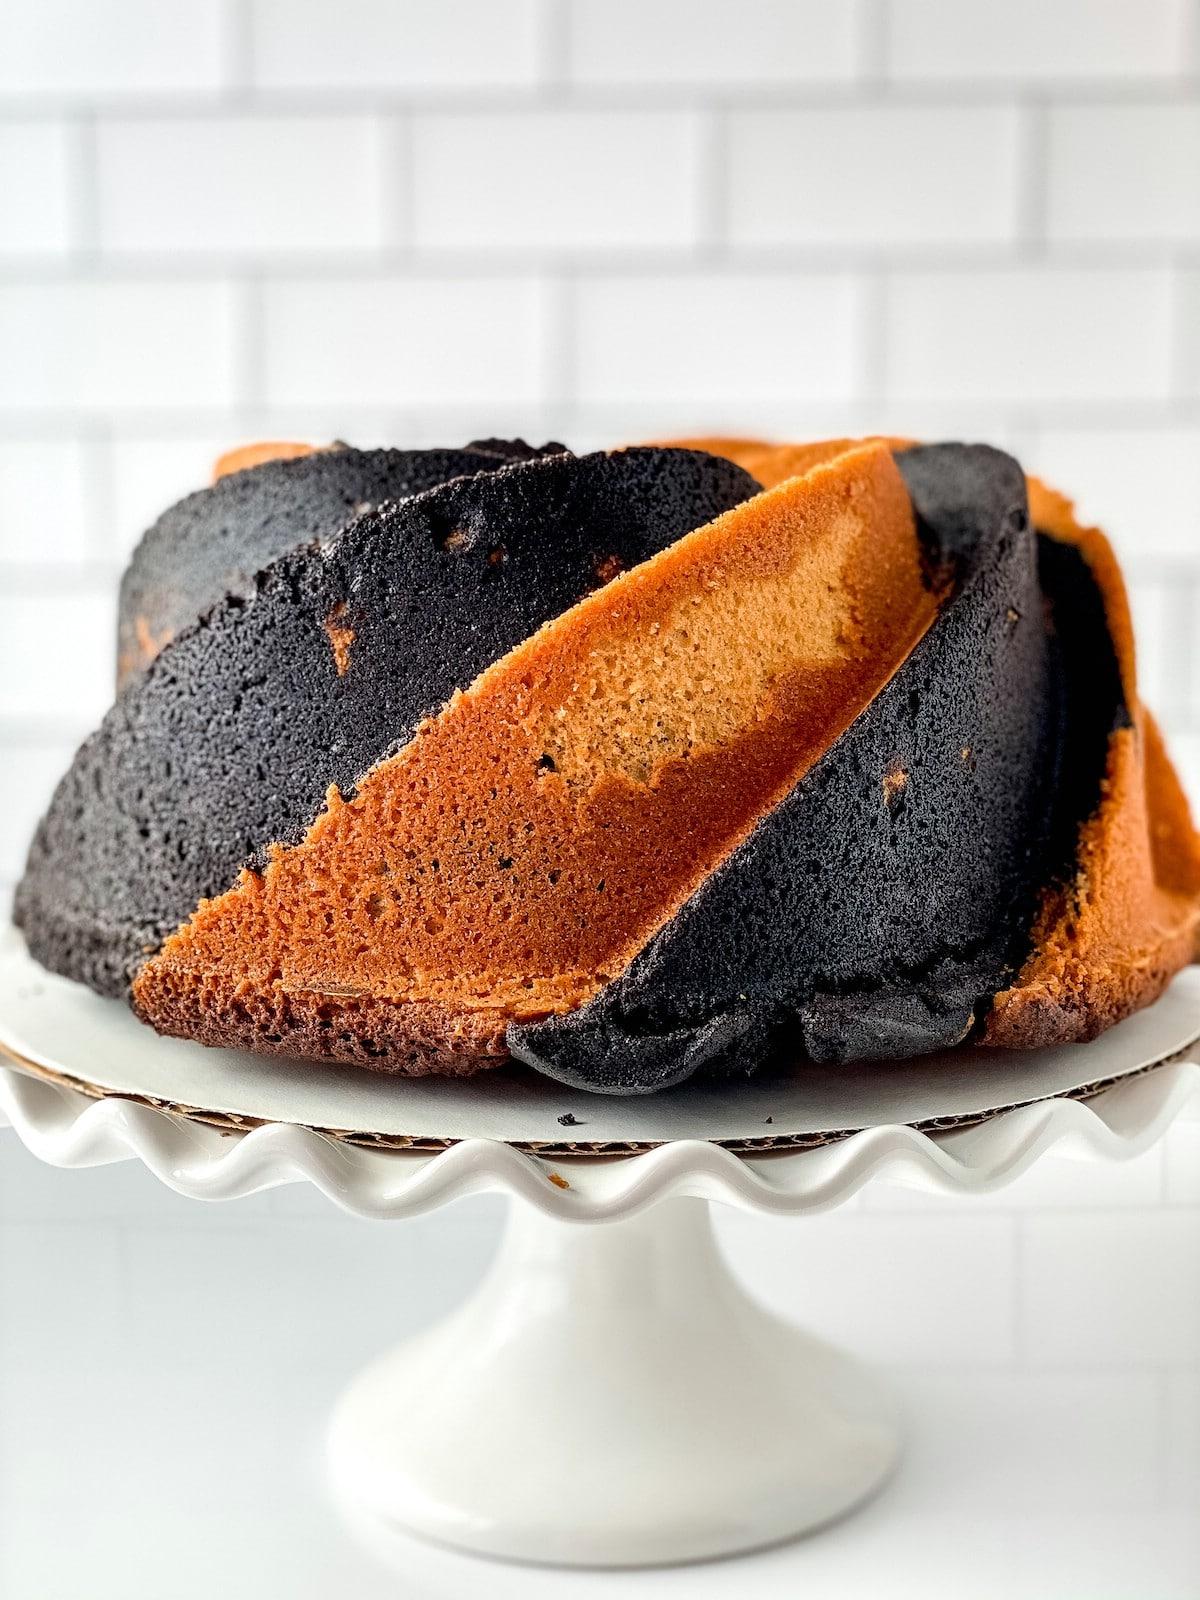 Baked black and orange cake on cake stand